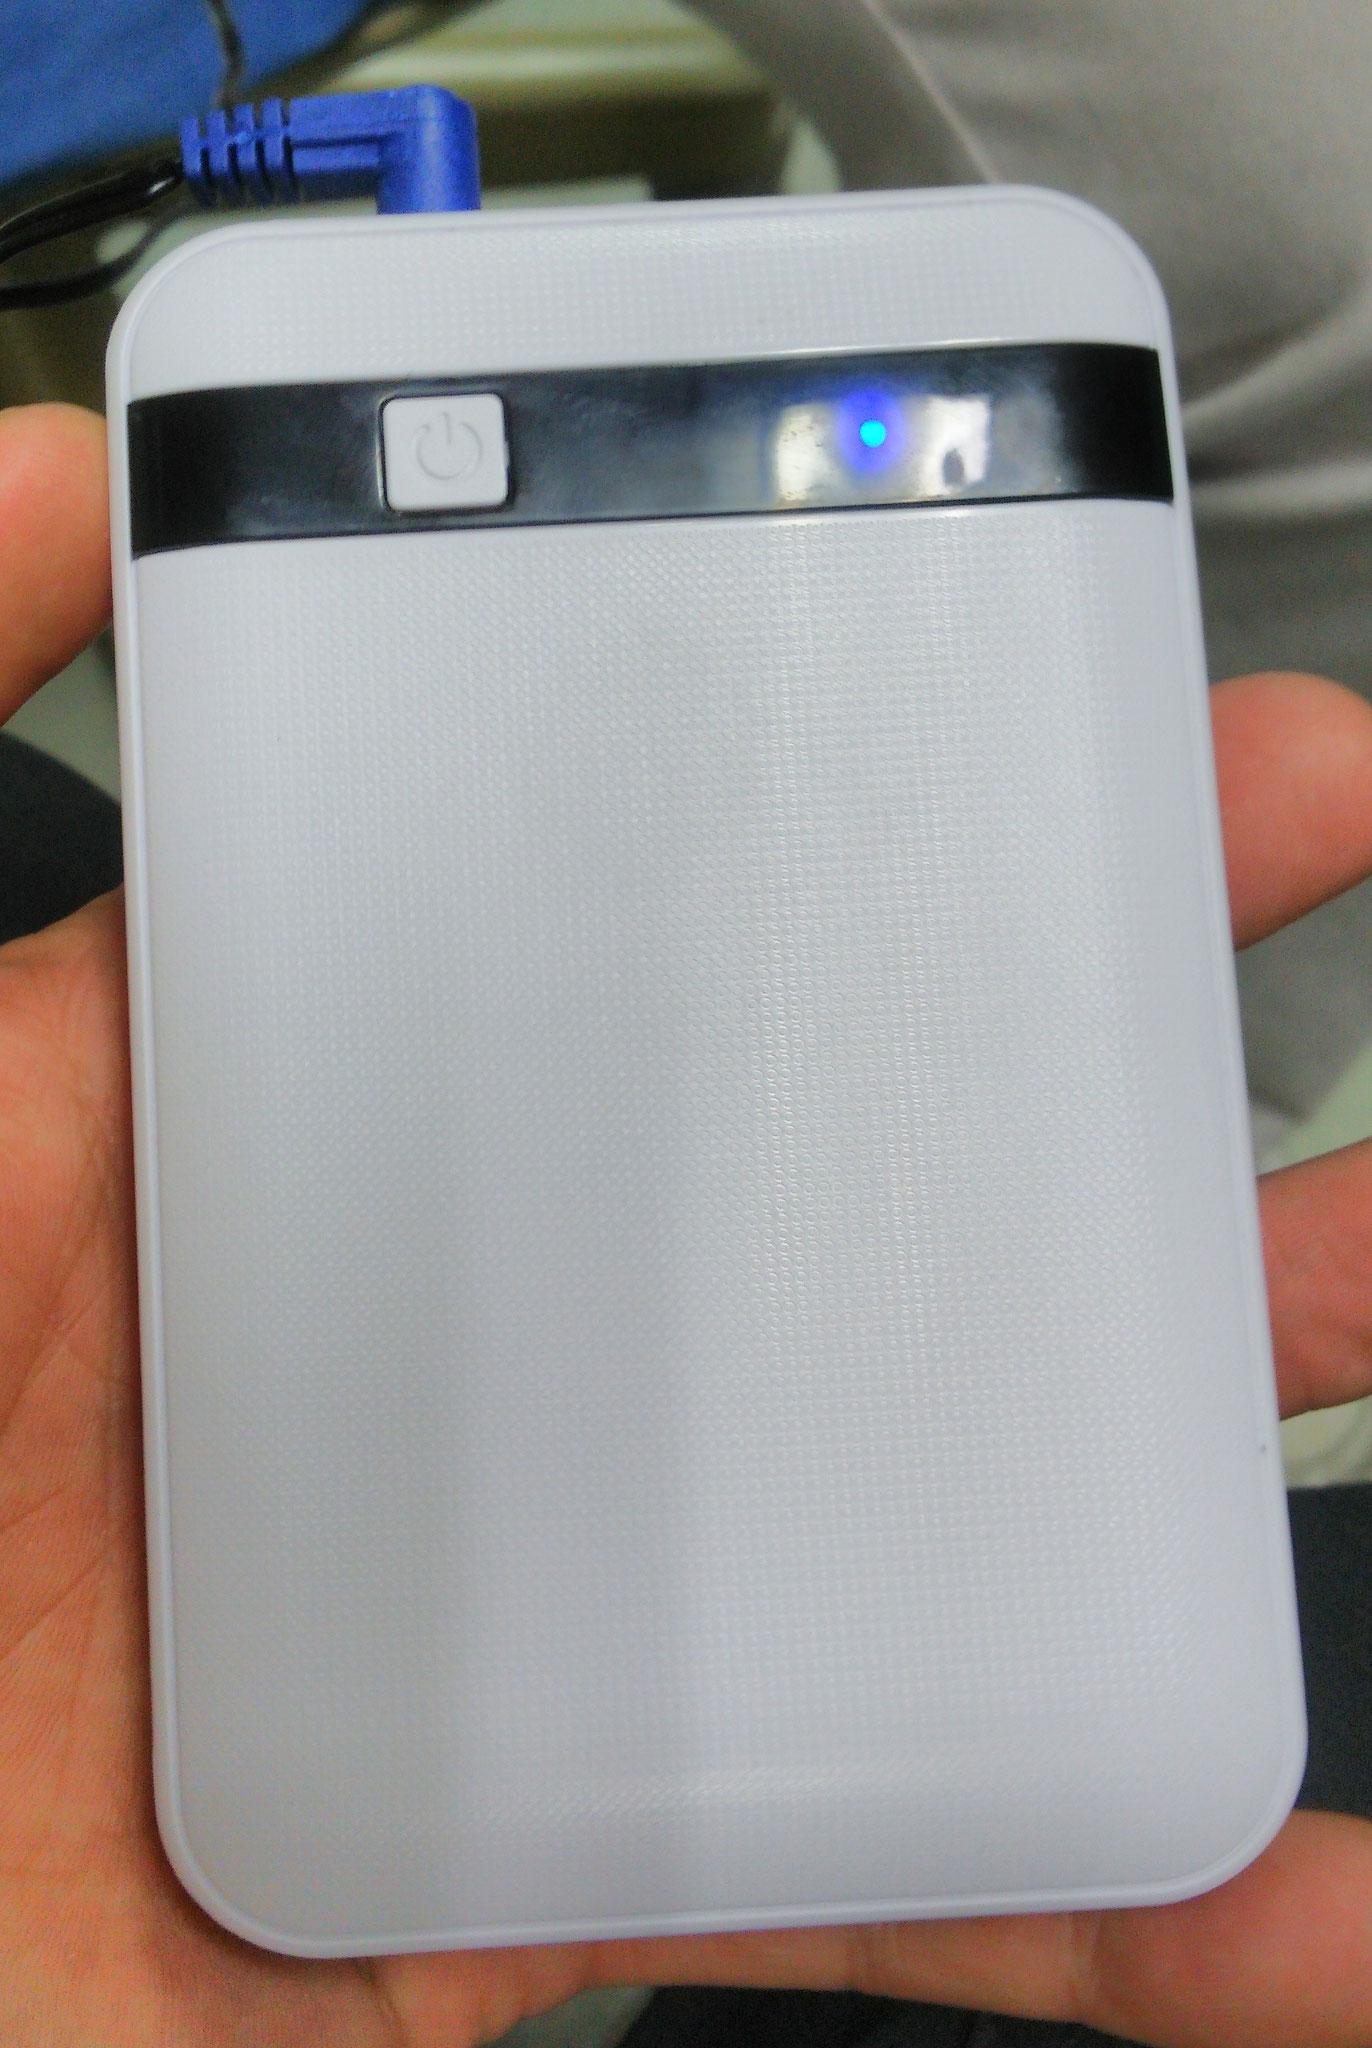 SK-06 バッテリーセット ¥6,930(税込)地域1番やしー価格で販売中!!